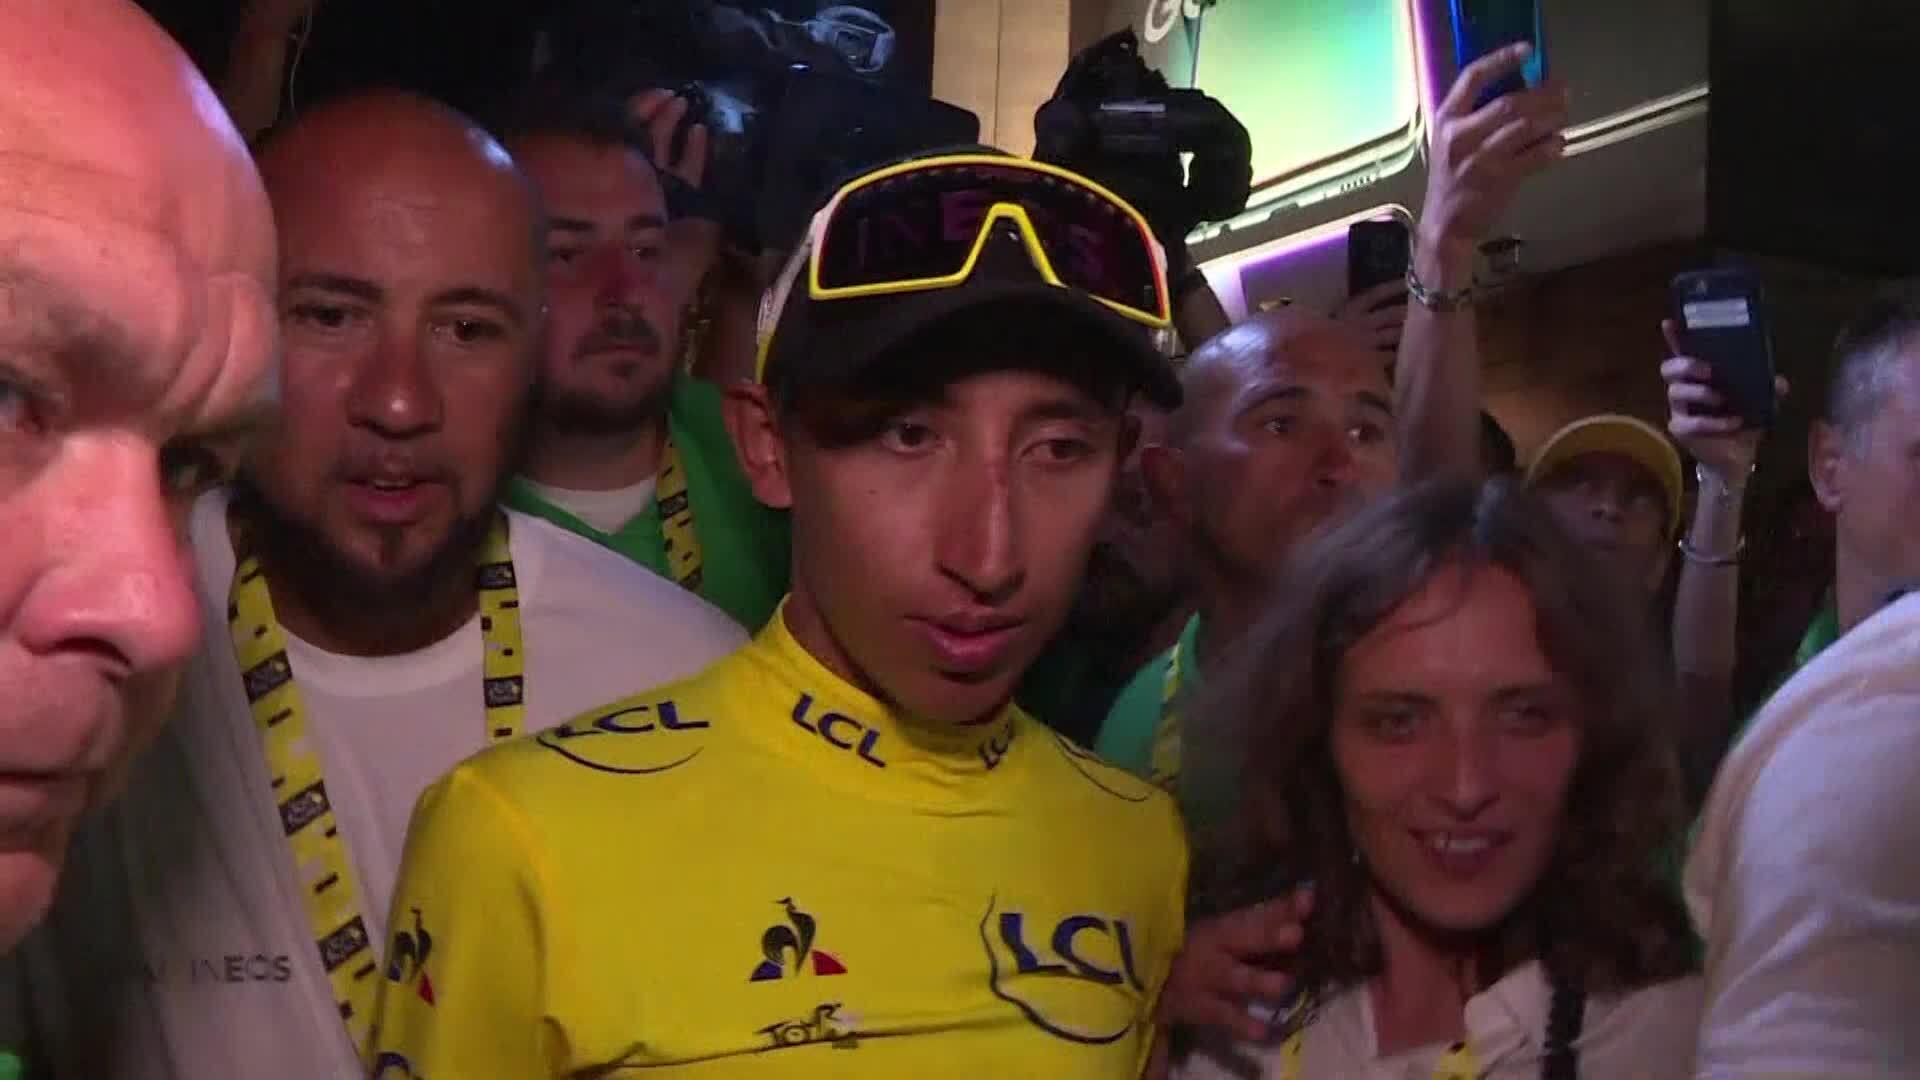 Egan Bernal brilliance at the Tour de France will mean tough choices for Team Ineos